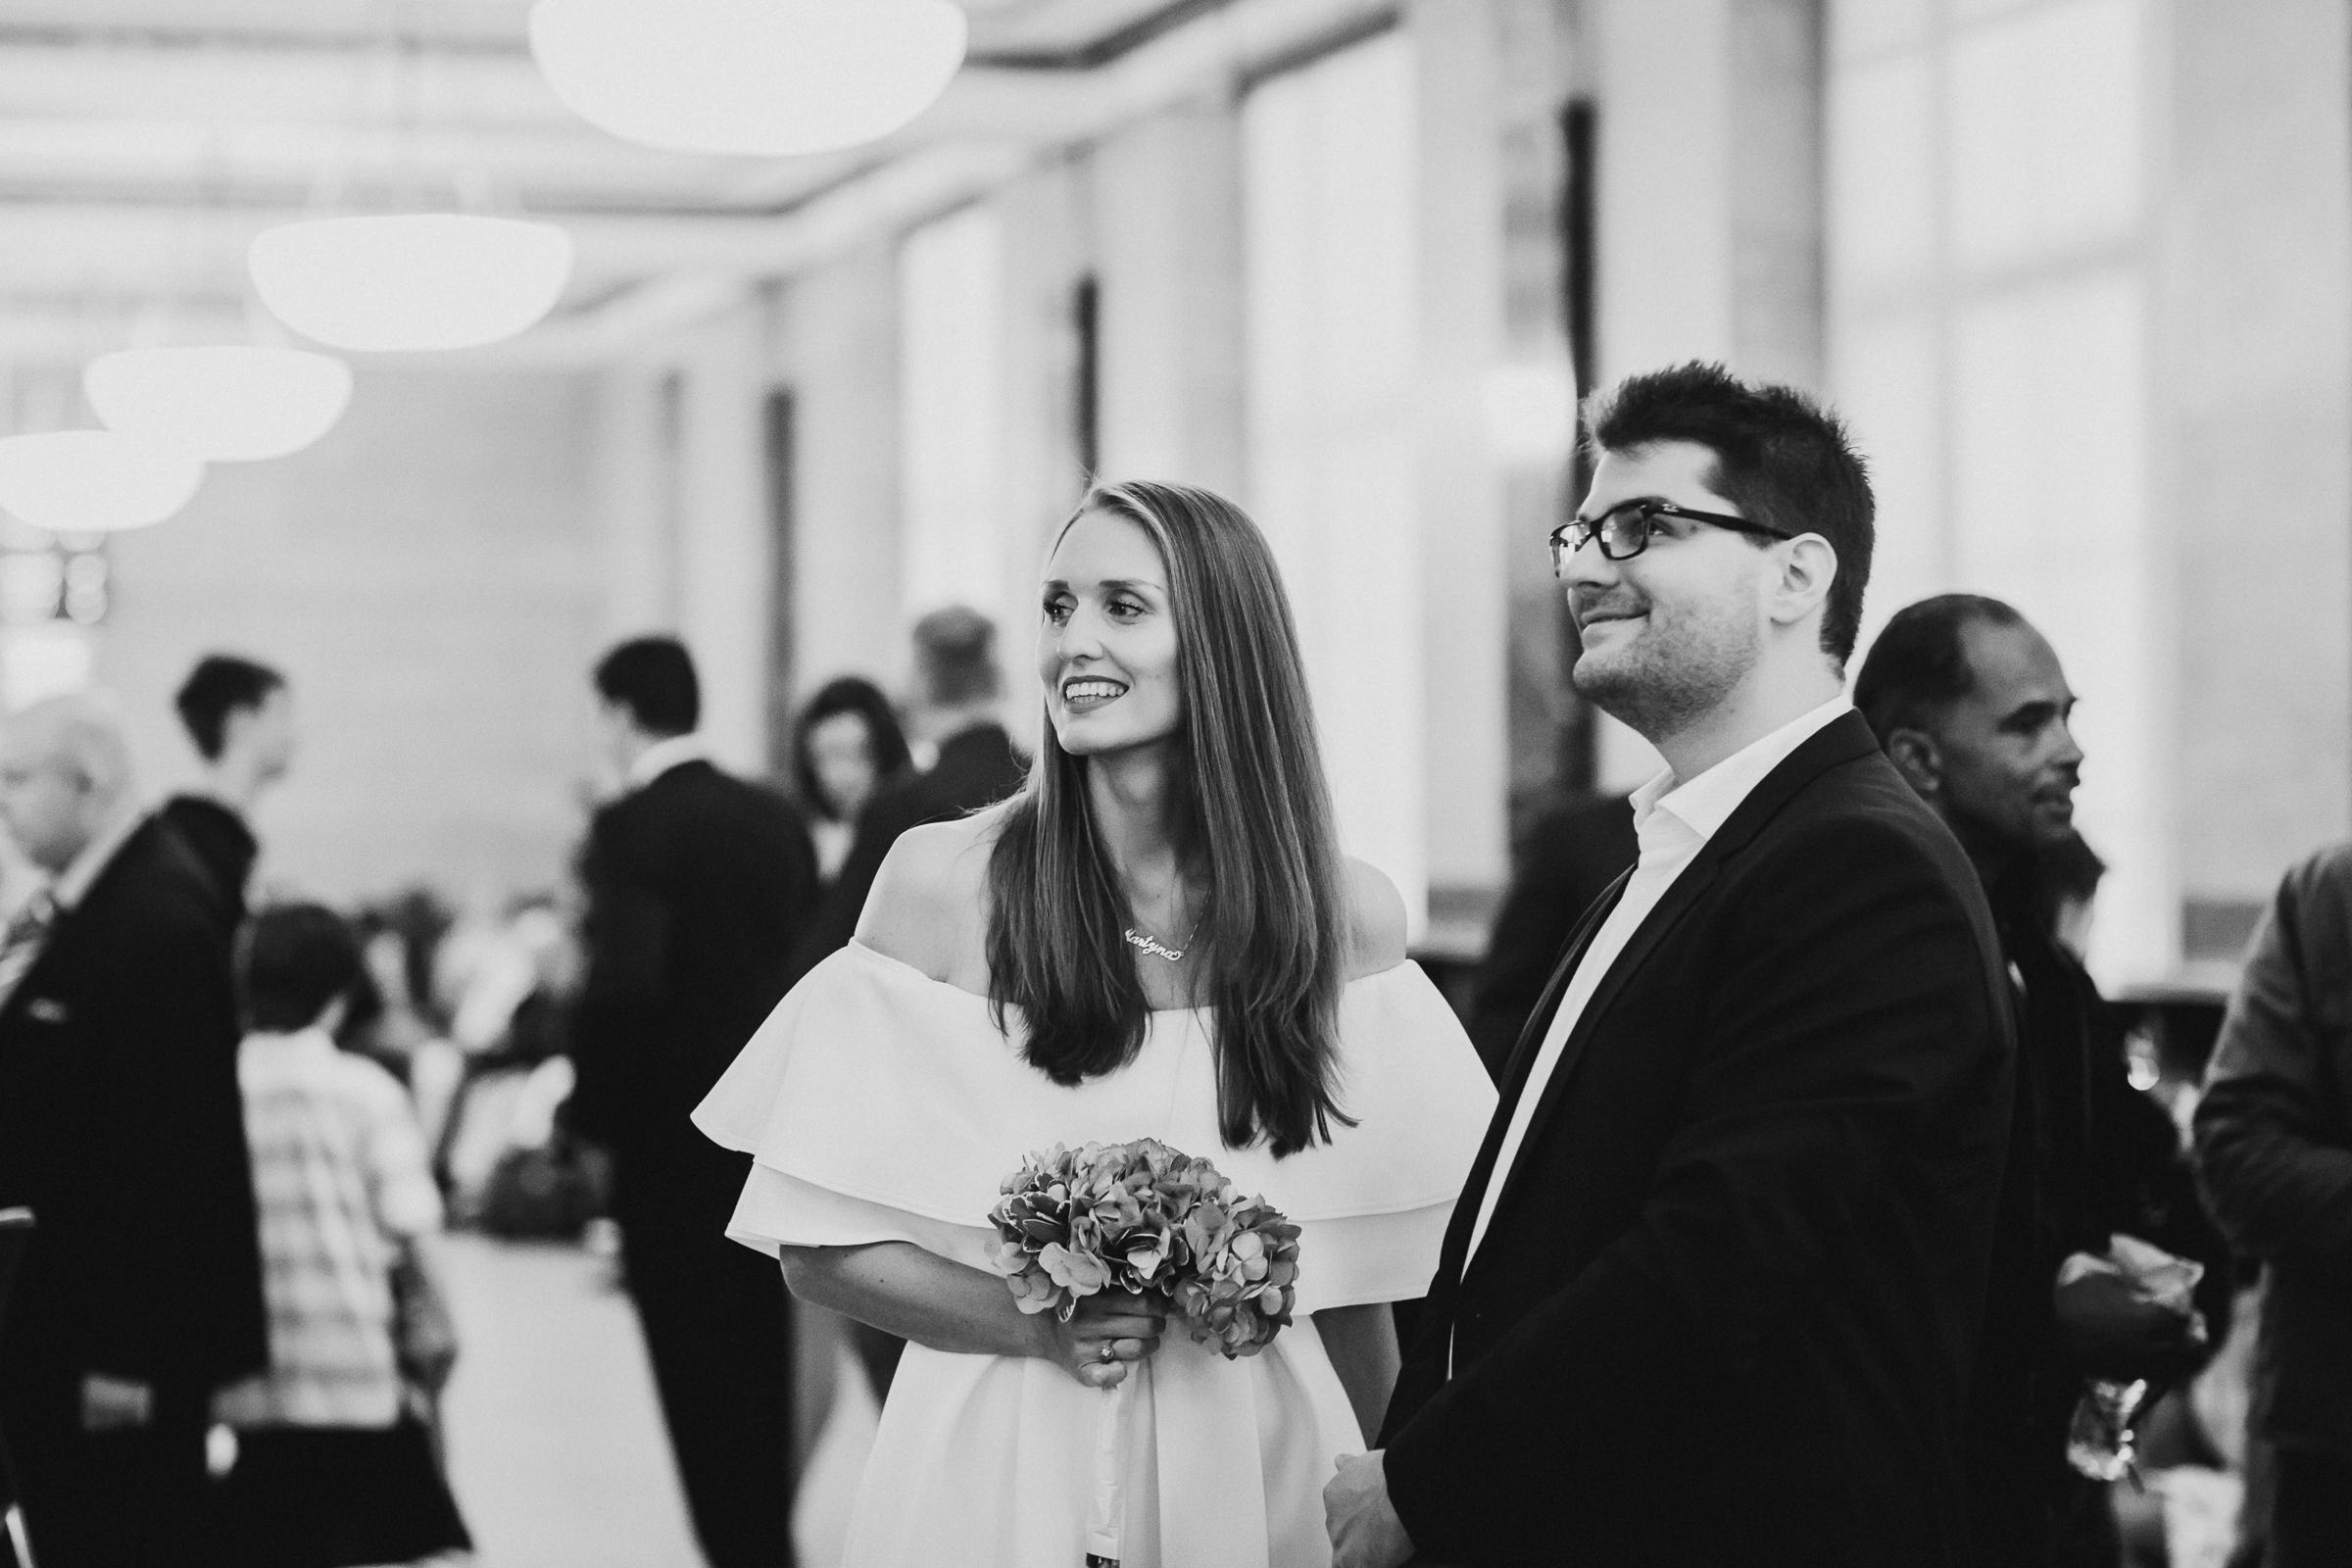 New-York-City-Hall-Elopement-NYC-Documentary-Wedding-Photographer-14.jpg